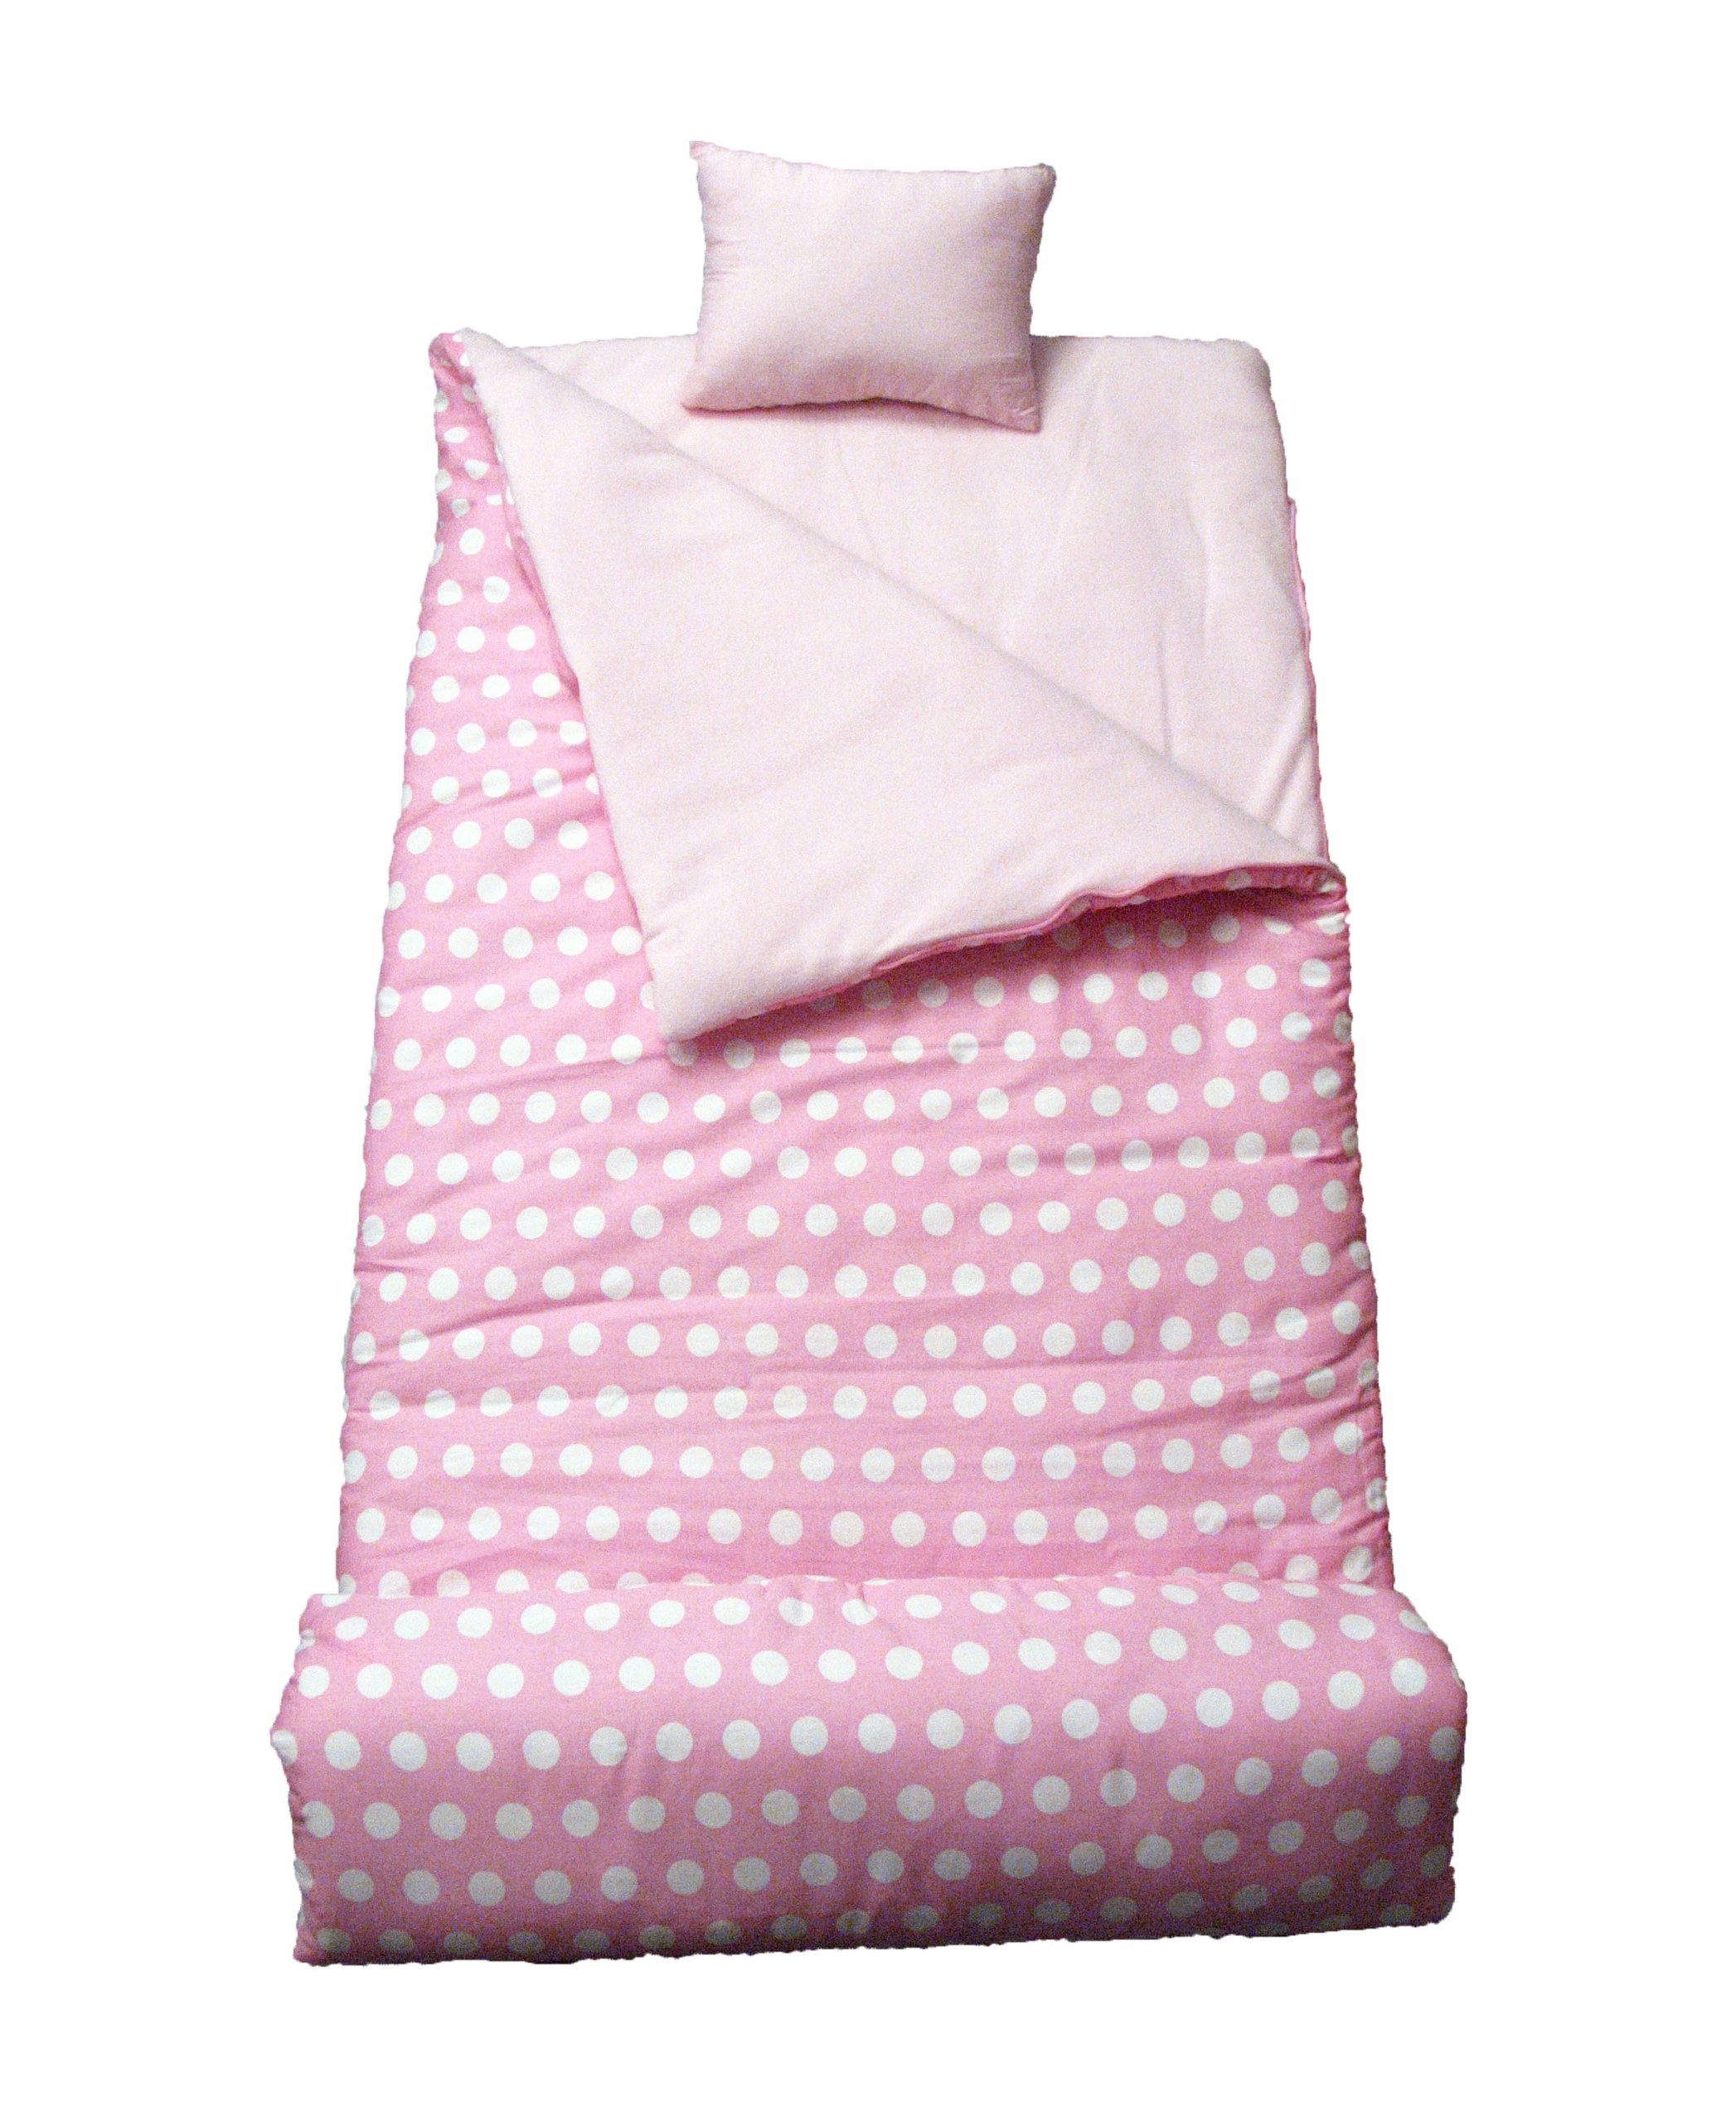 SoHo Kids Sleeping Bag 50 Degree, Pink Polka by SoHo Designs